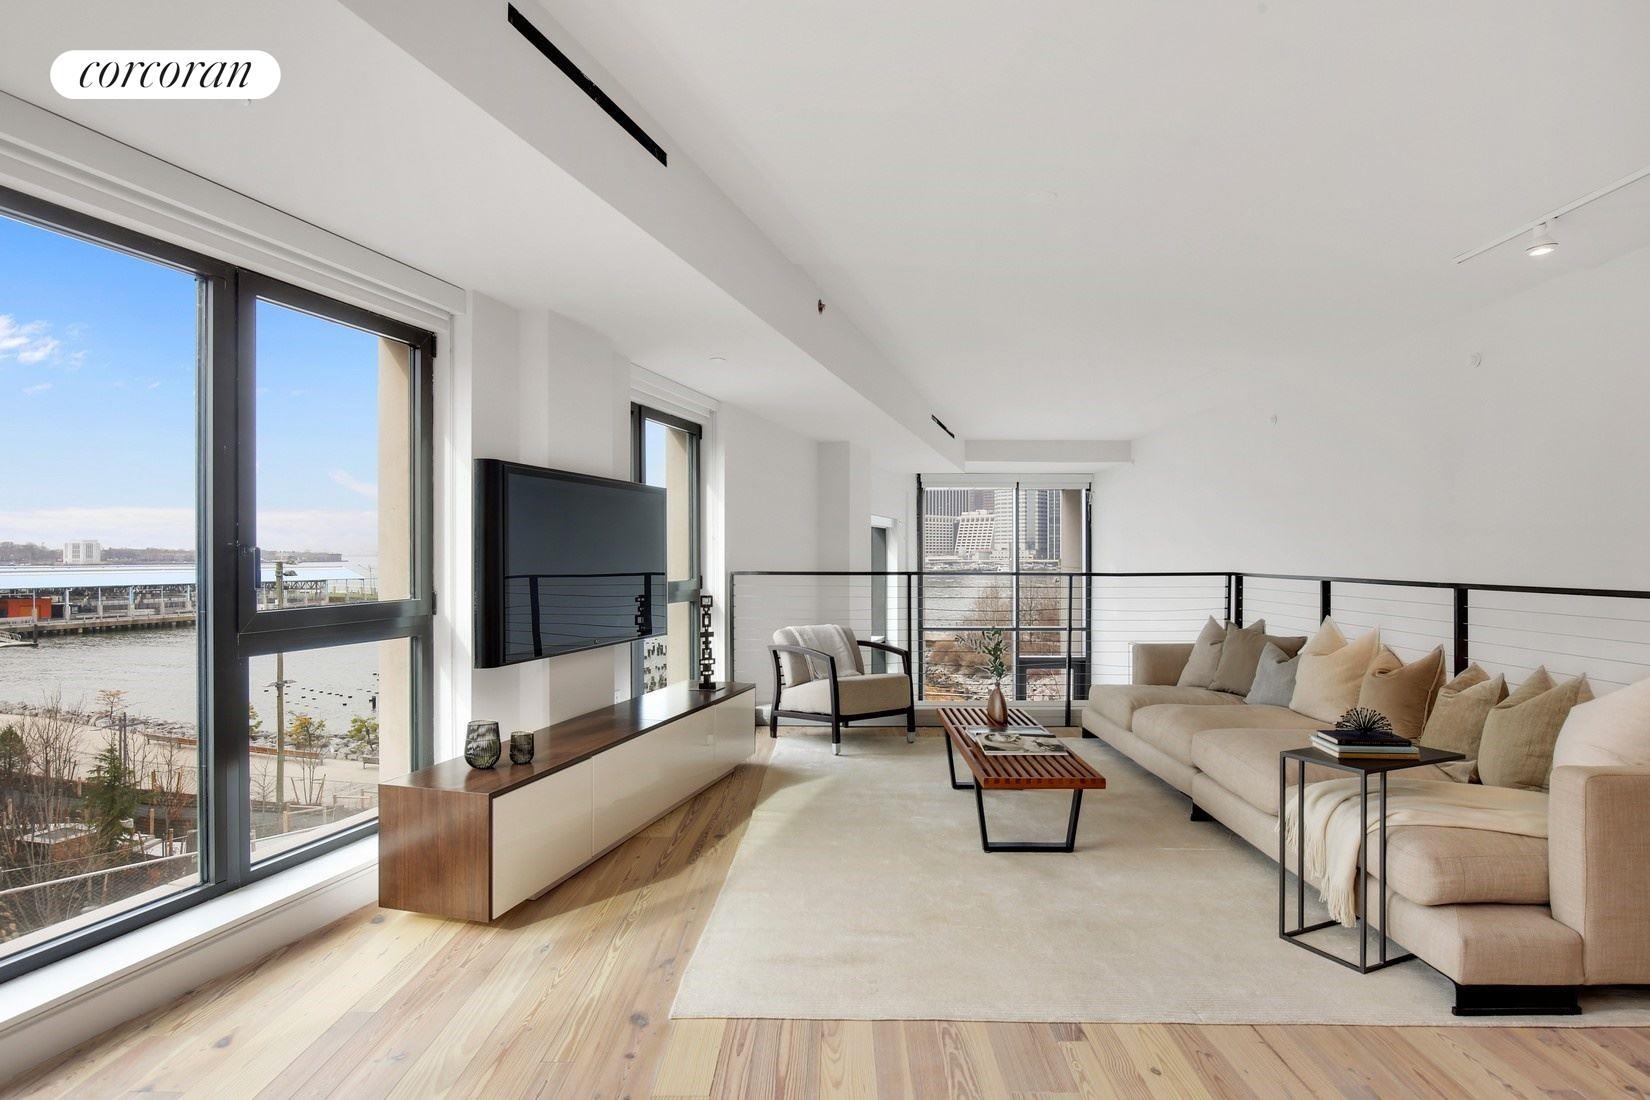 Corcoran, 90 Furman Street, Apt. N415, Brooklyn Heights Real Estate ...